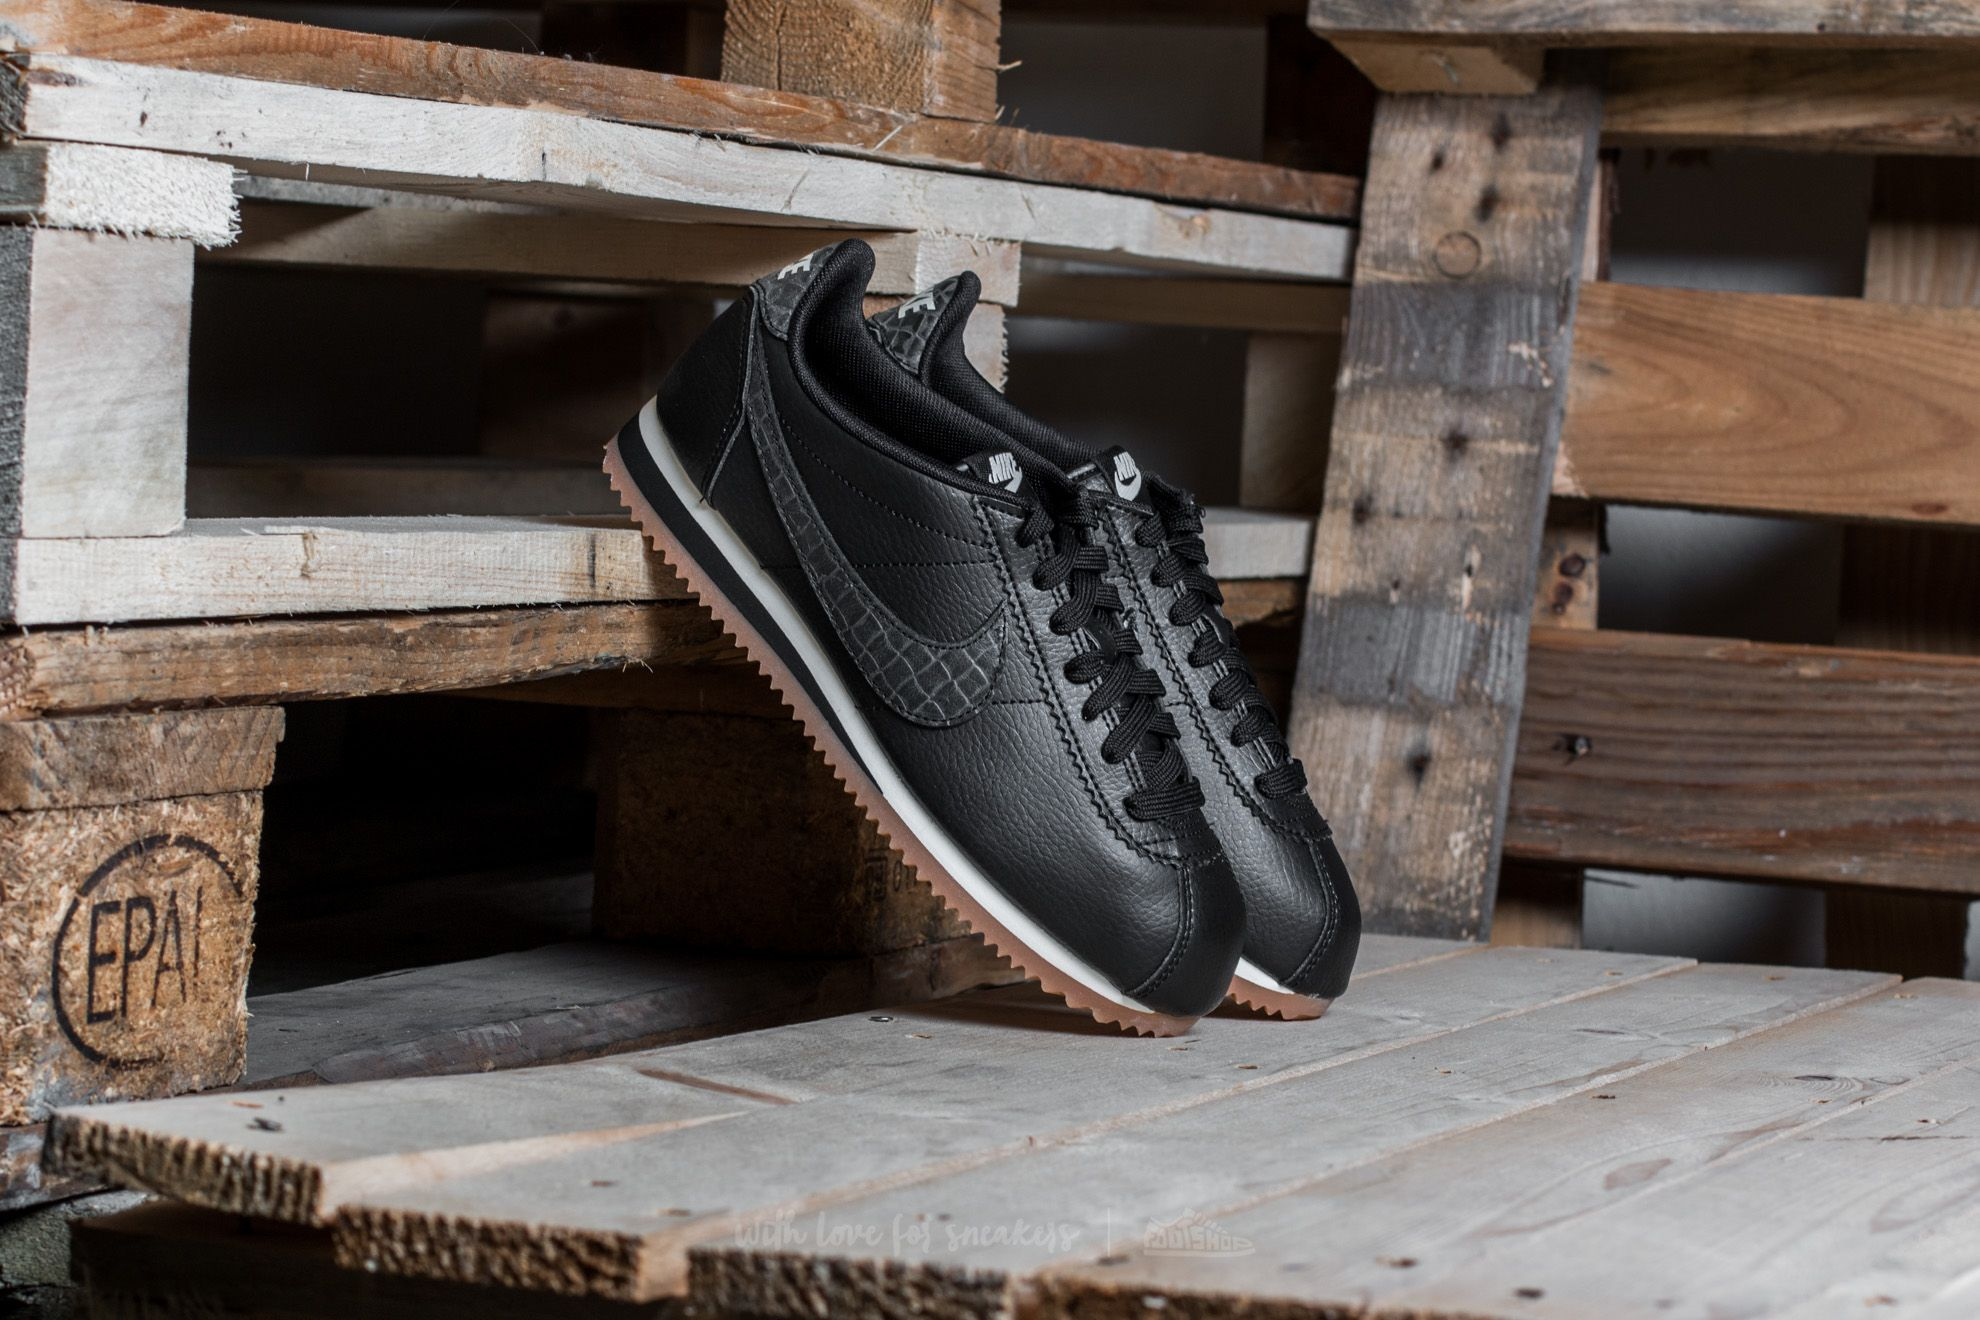 newest collection d6734 aef6d Nike W Classic Cortez Leather Lux Black/ Black-Sail-Gum Medium ...